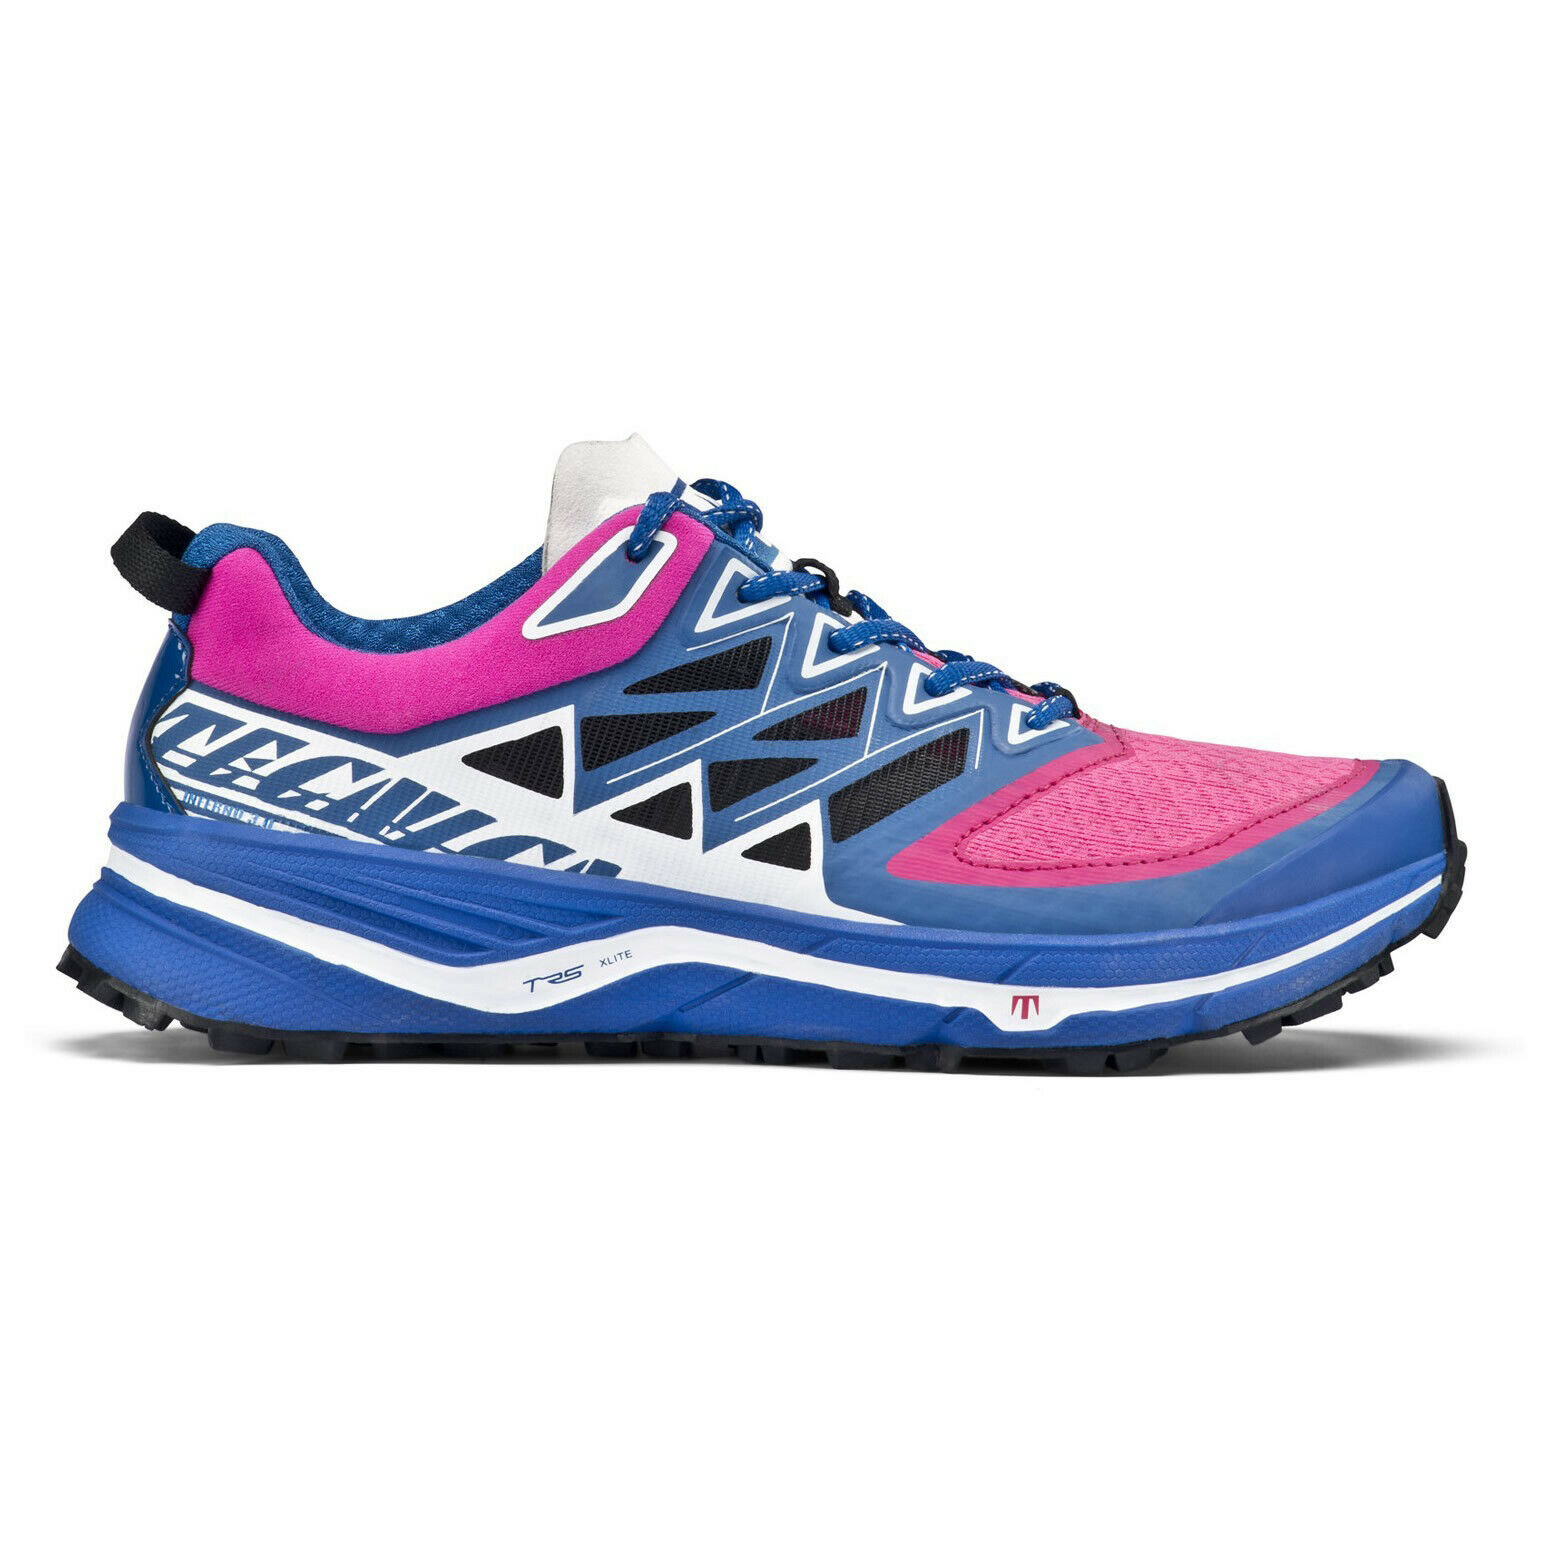 Tecnica Inferno Xlite 3.0 Ws scarpe trail running donna fucsiablu